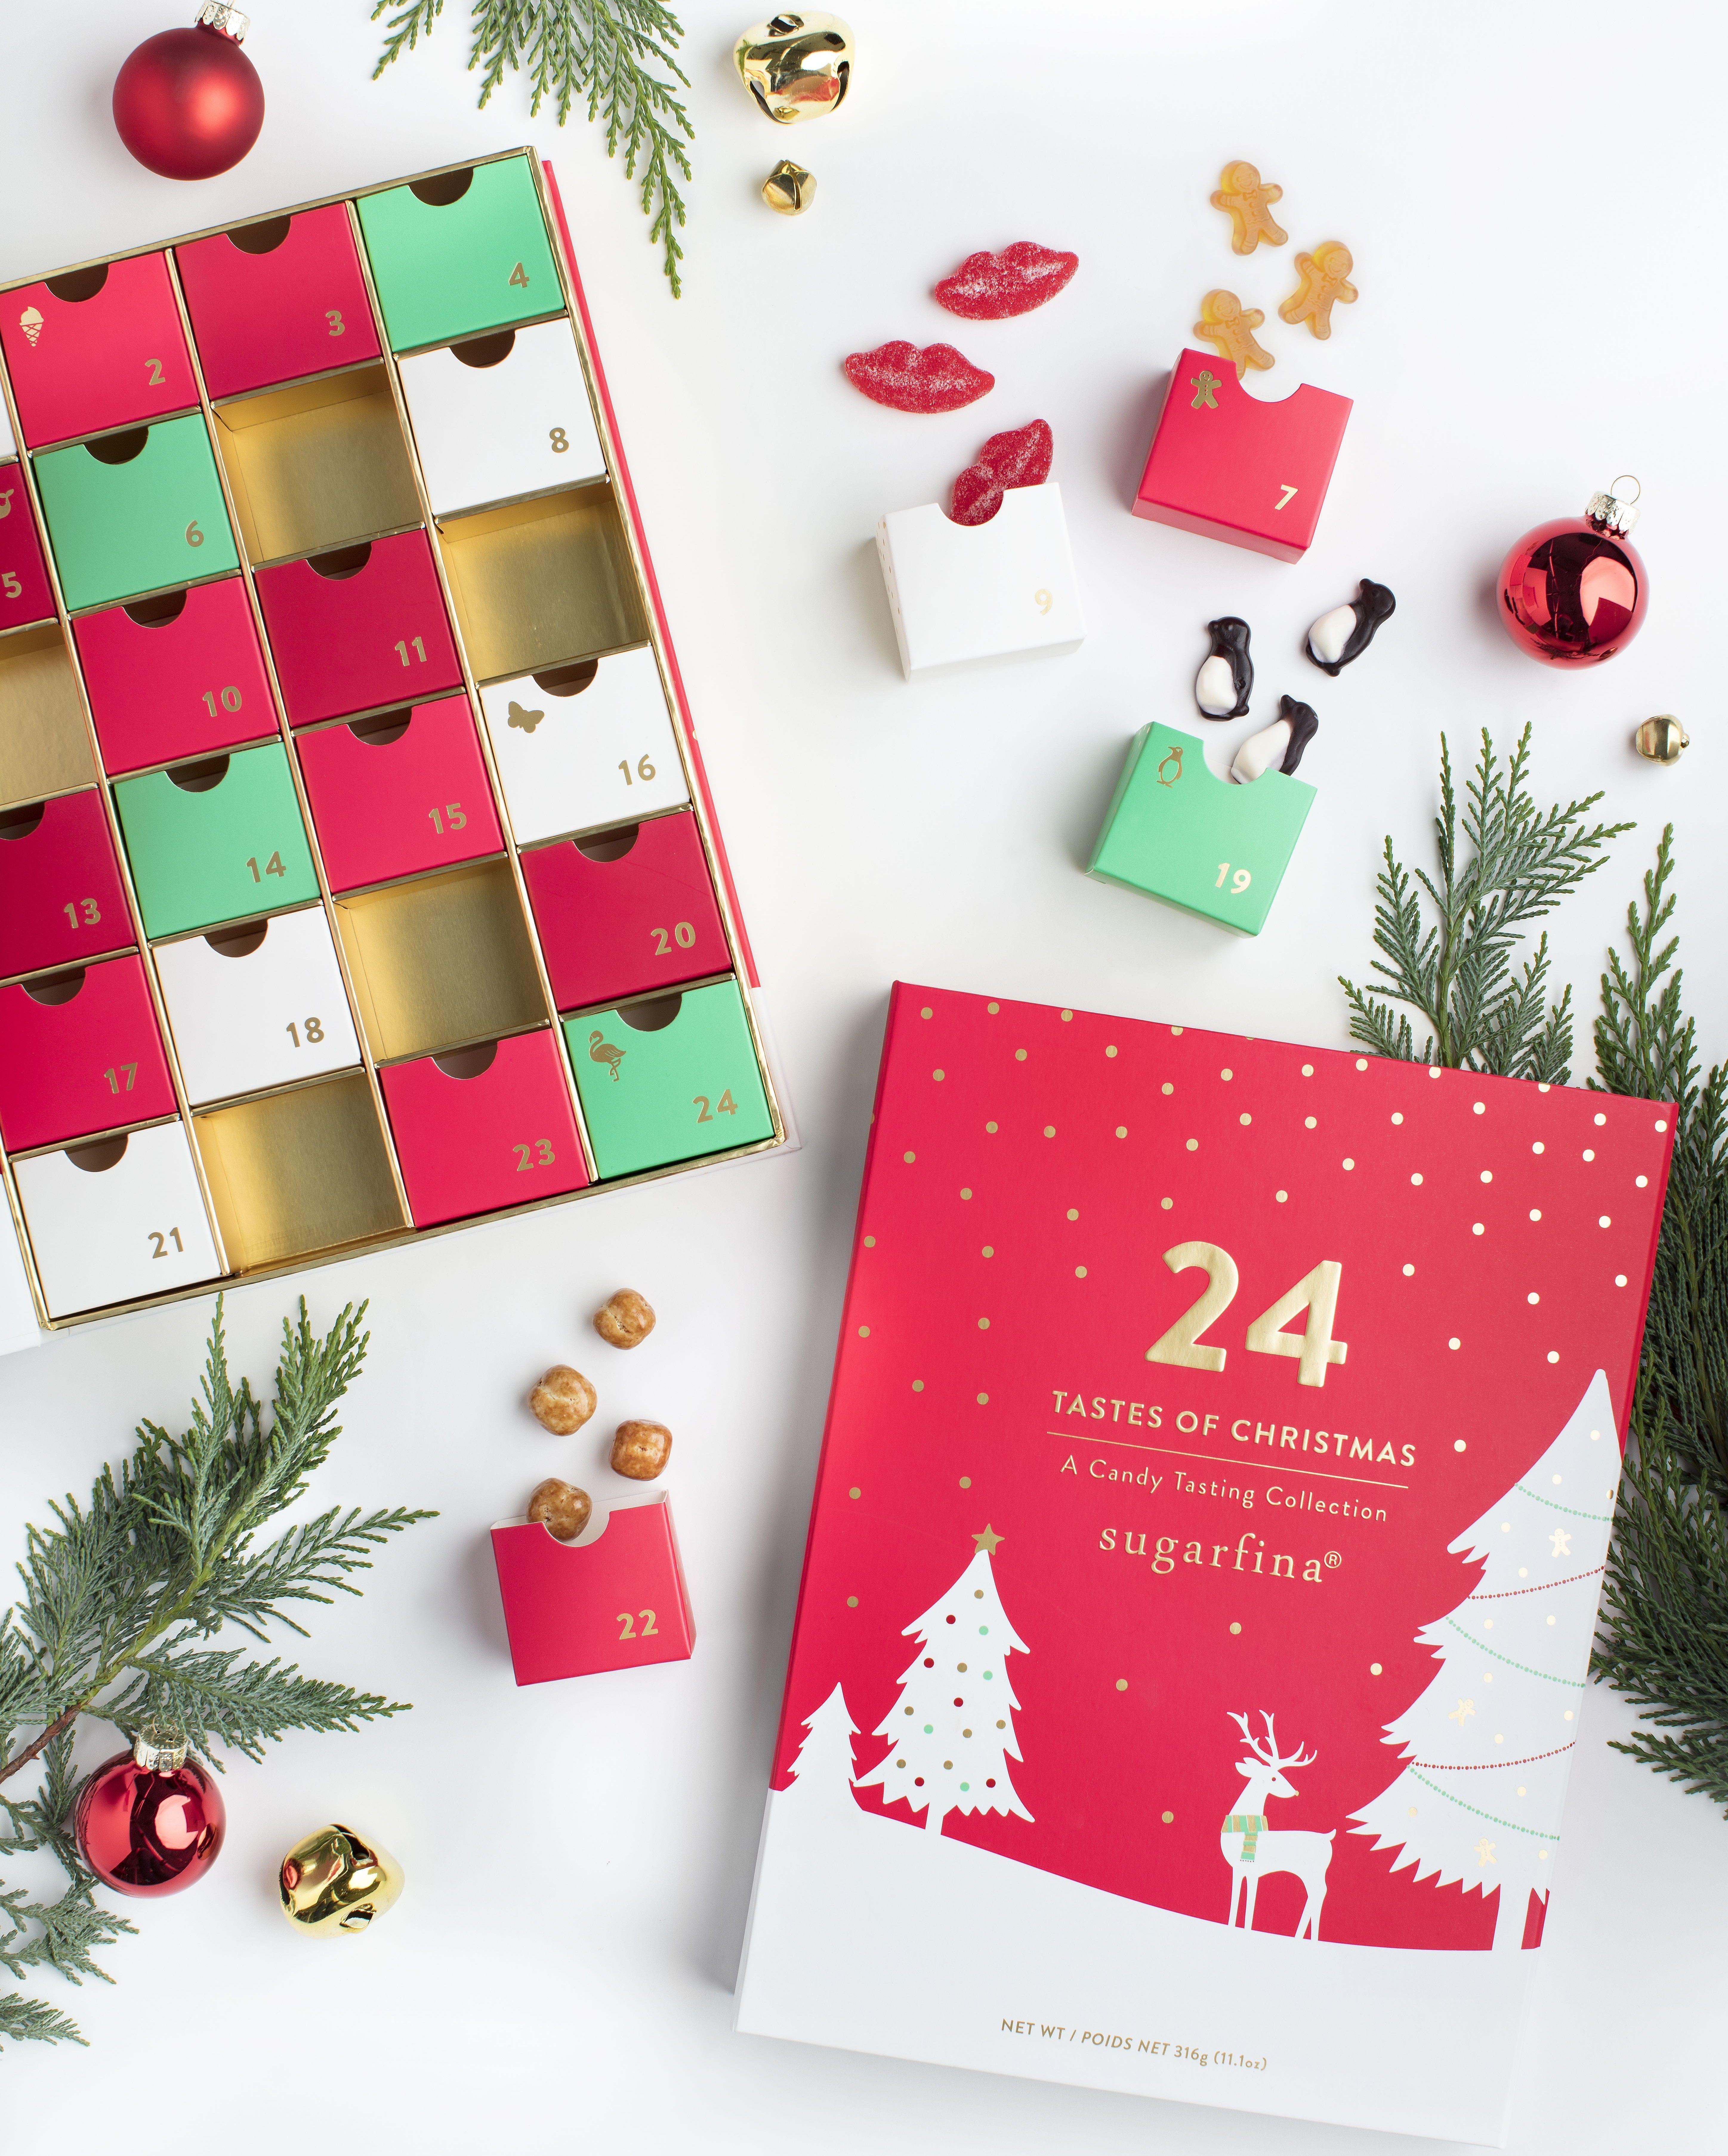 8 Amazing Advent Calendars Chocolate Wine And More Christmas Advent Calendar Advent Calendars For Kids Christmas Advent